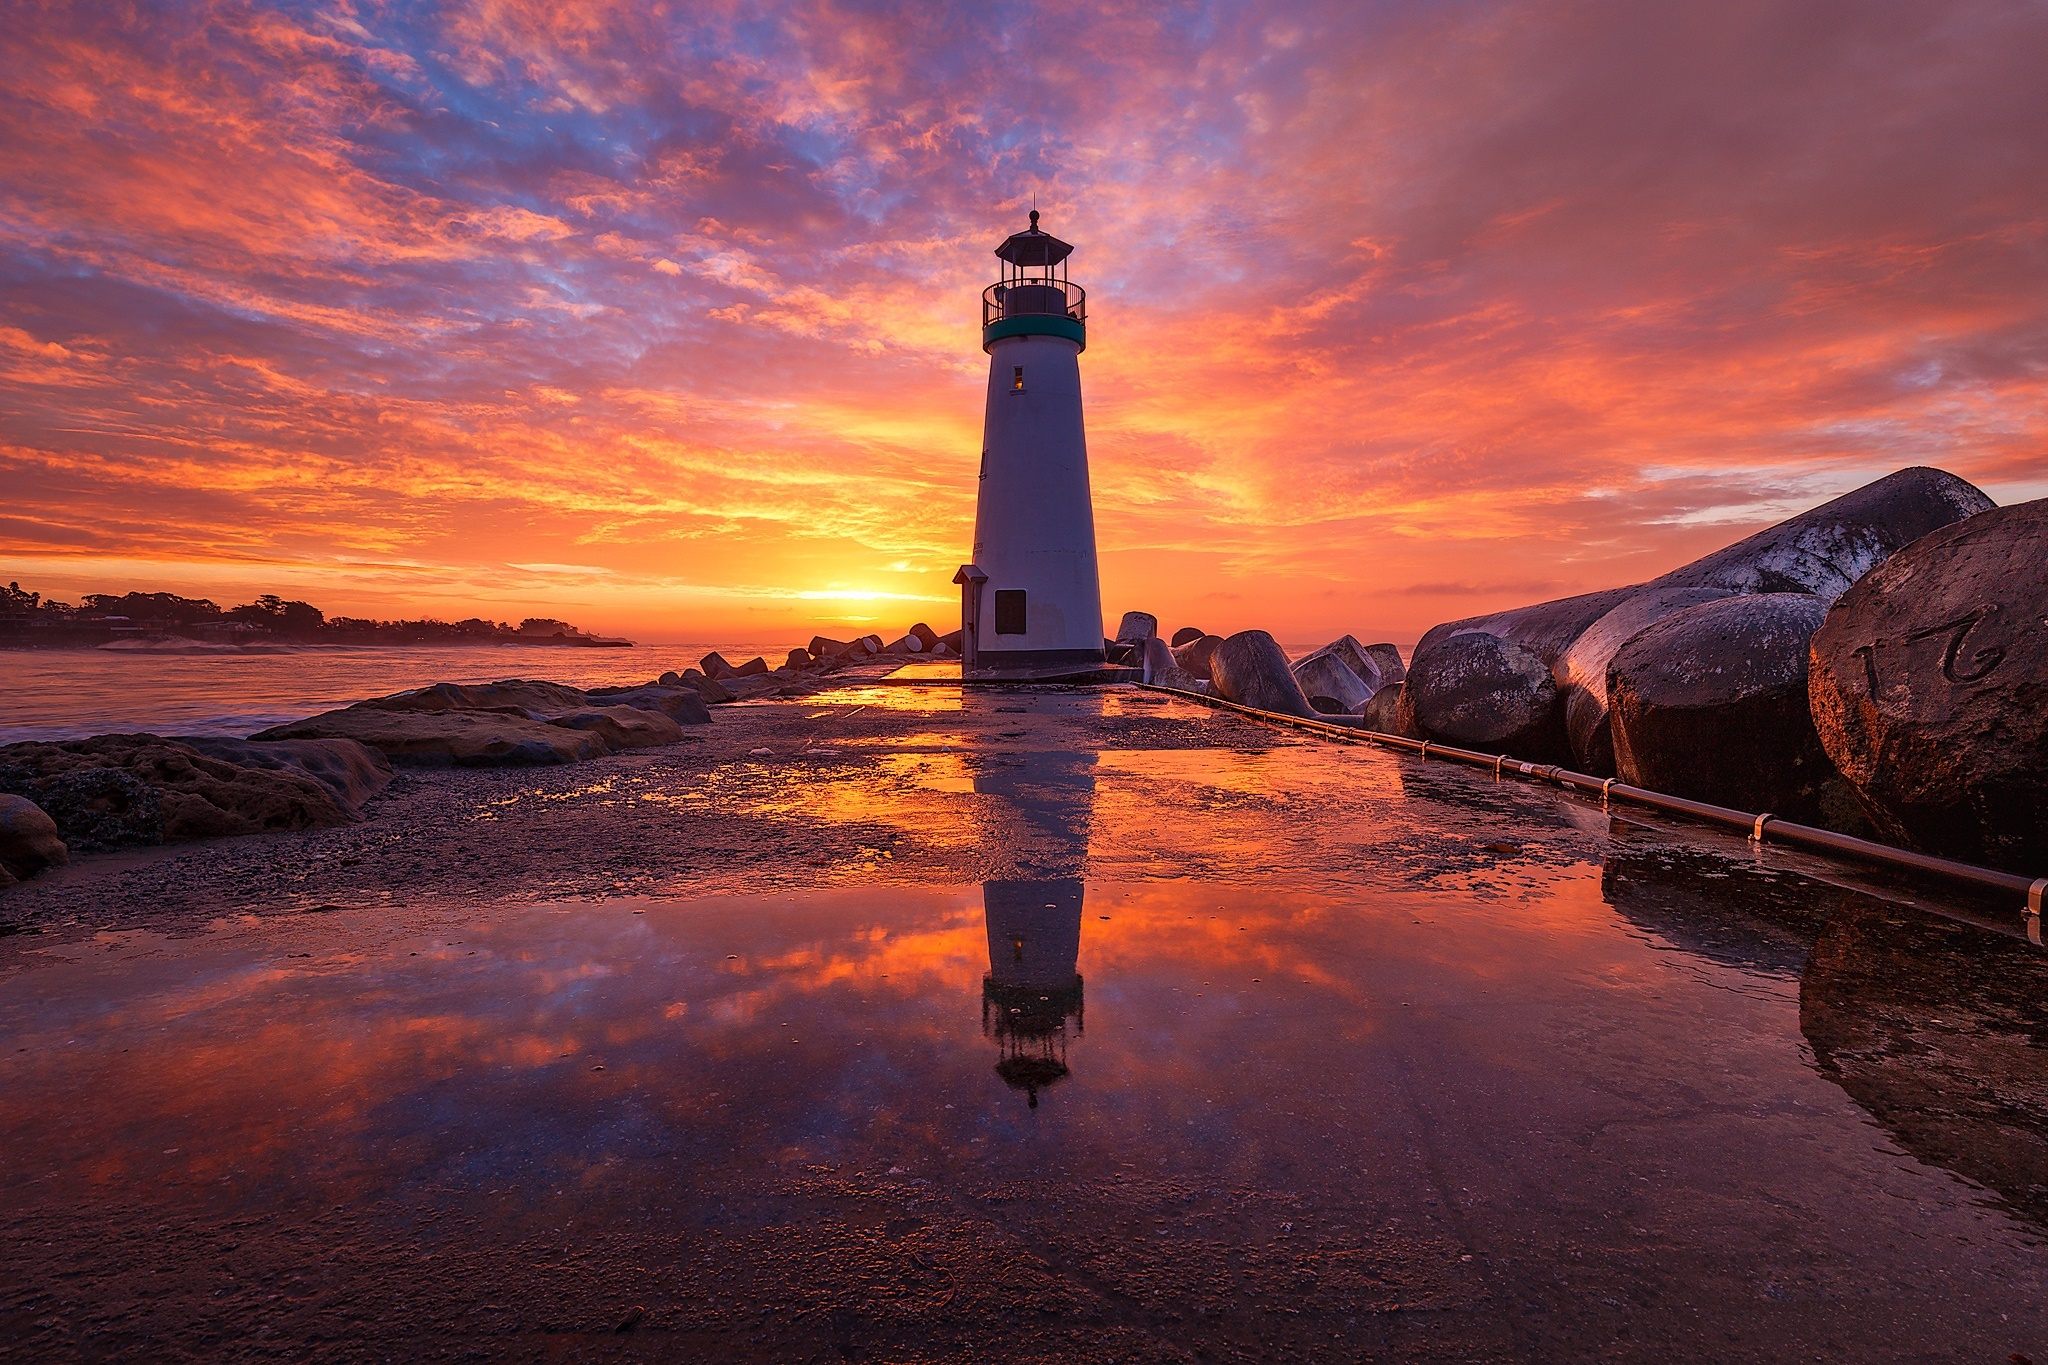 Building Reflection Sunrise Sky 2048x1365